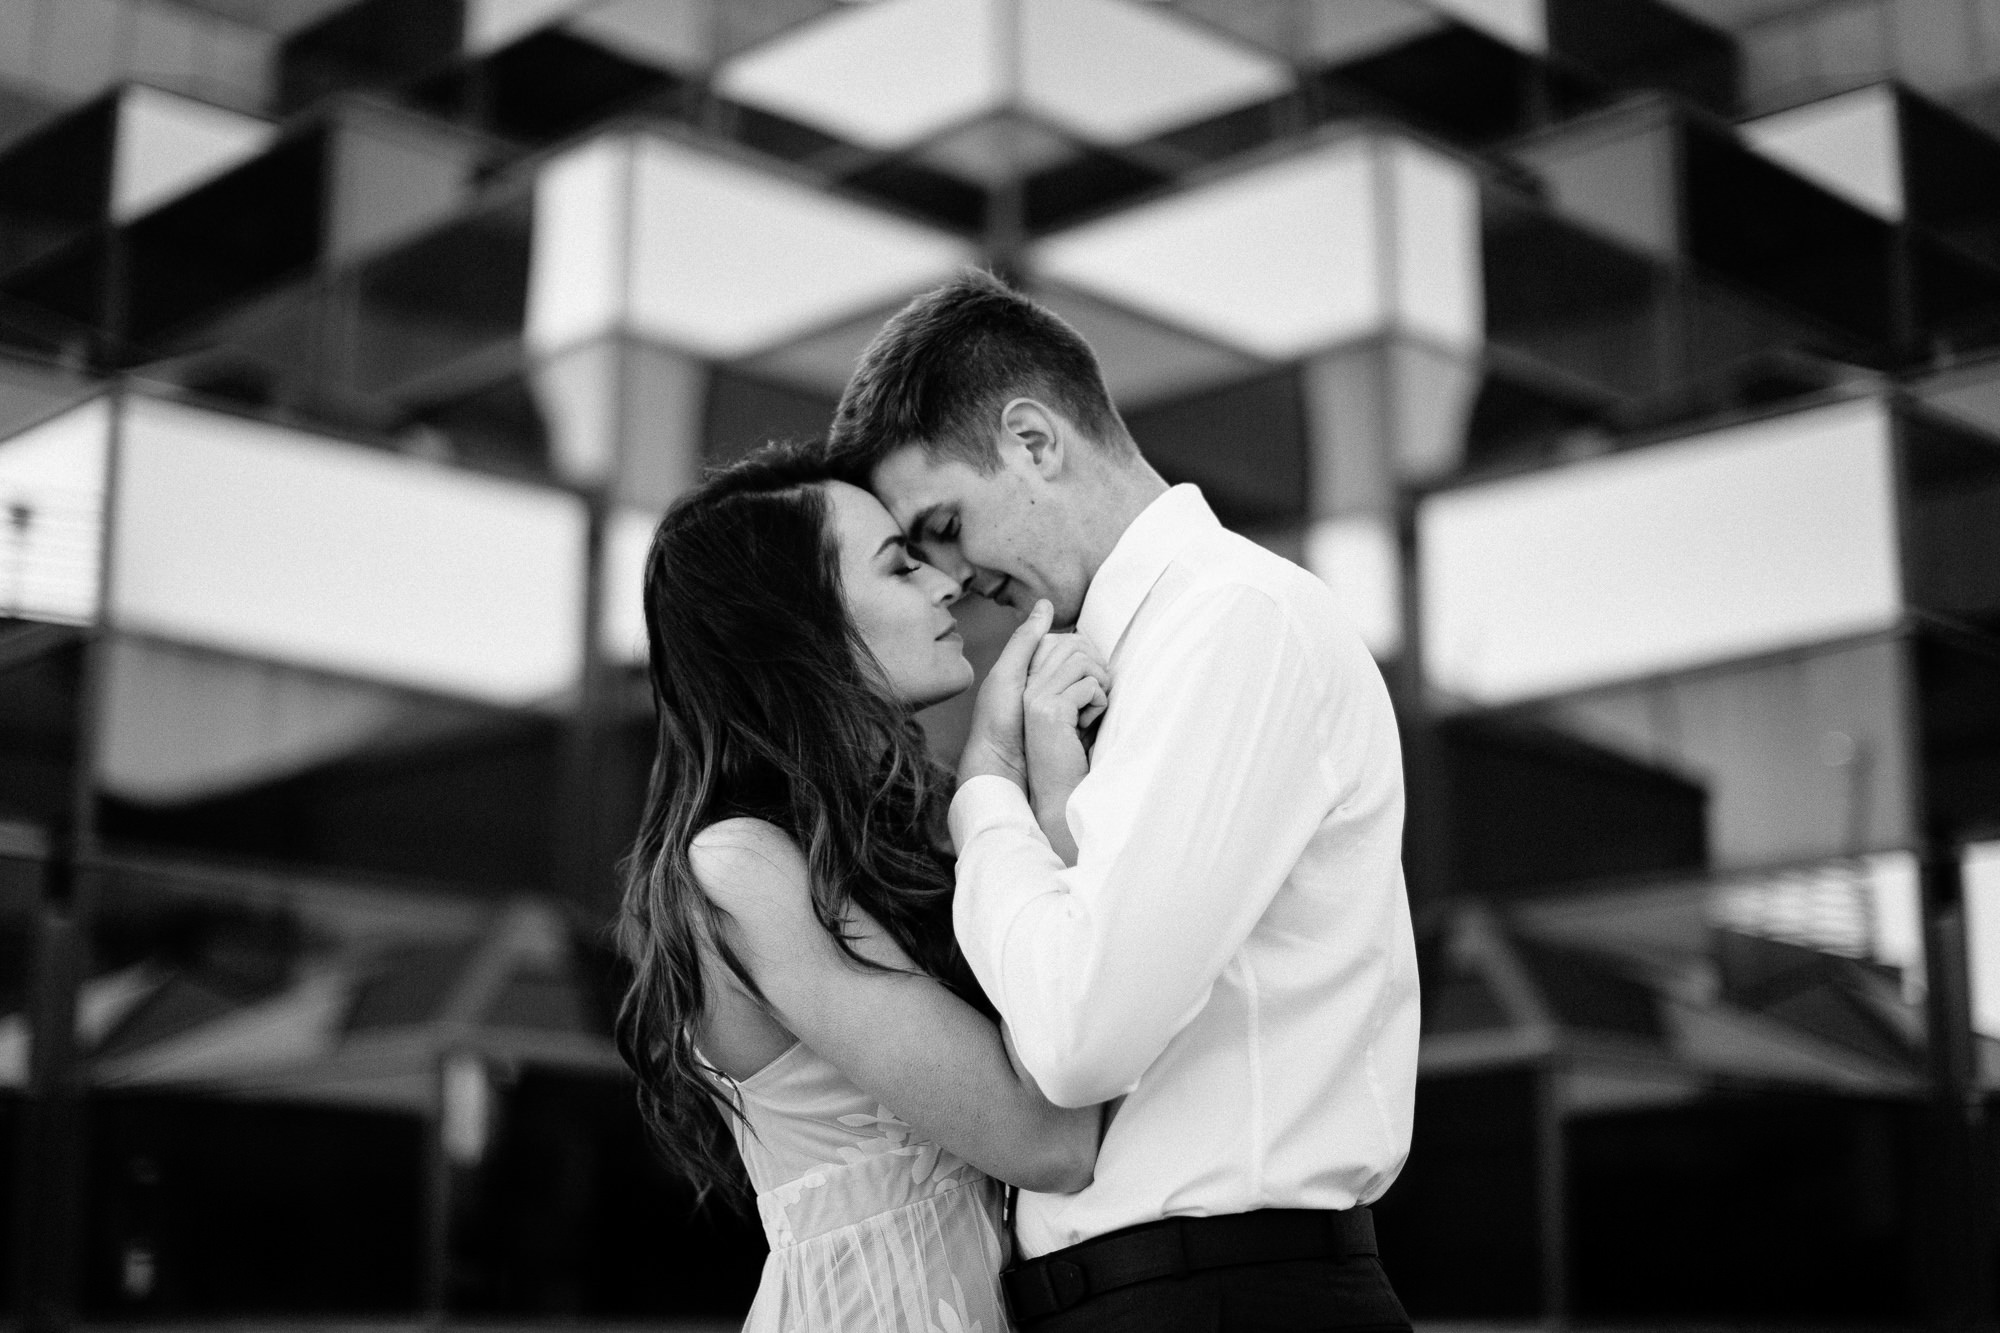 wedding-elopement-adventerous-romantic-timeless-des-moines-siouxfalls-photography-20.jpg